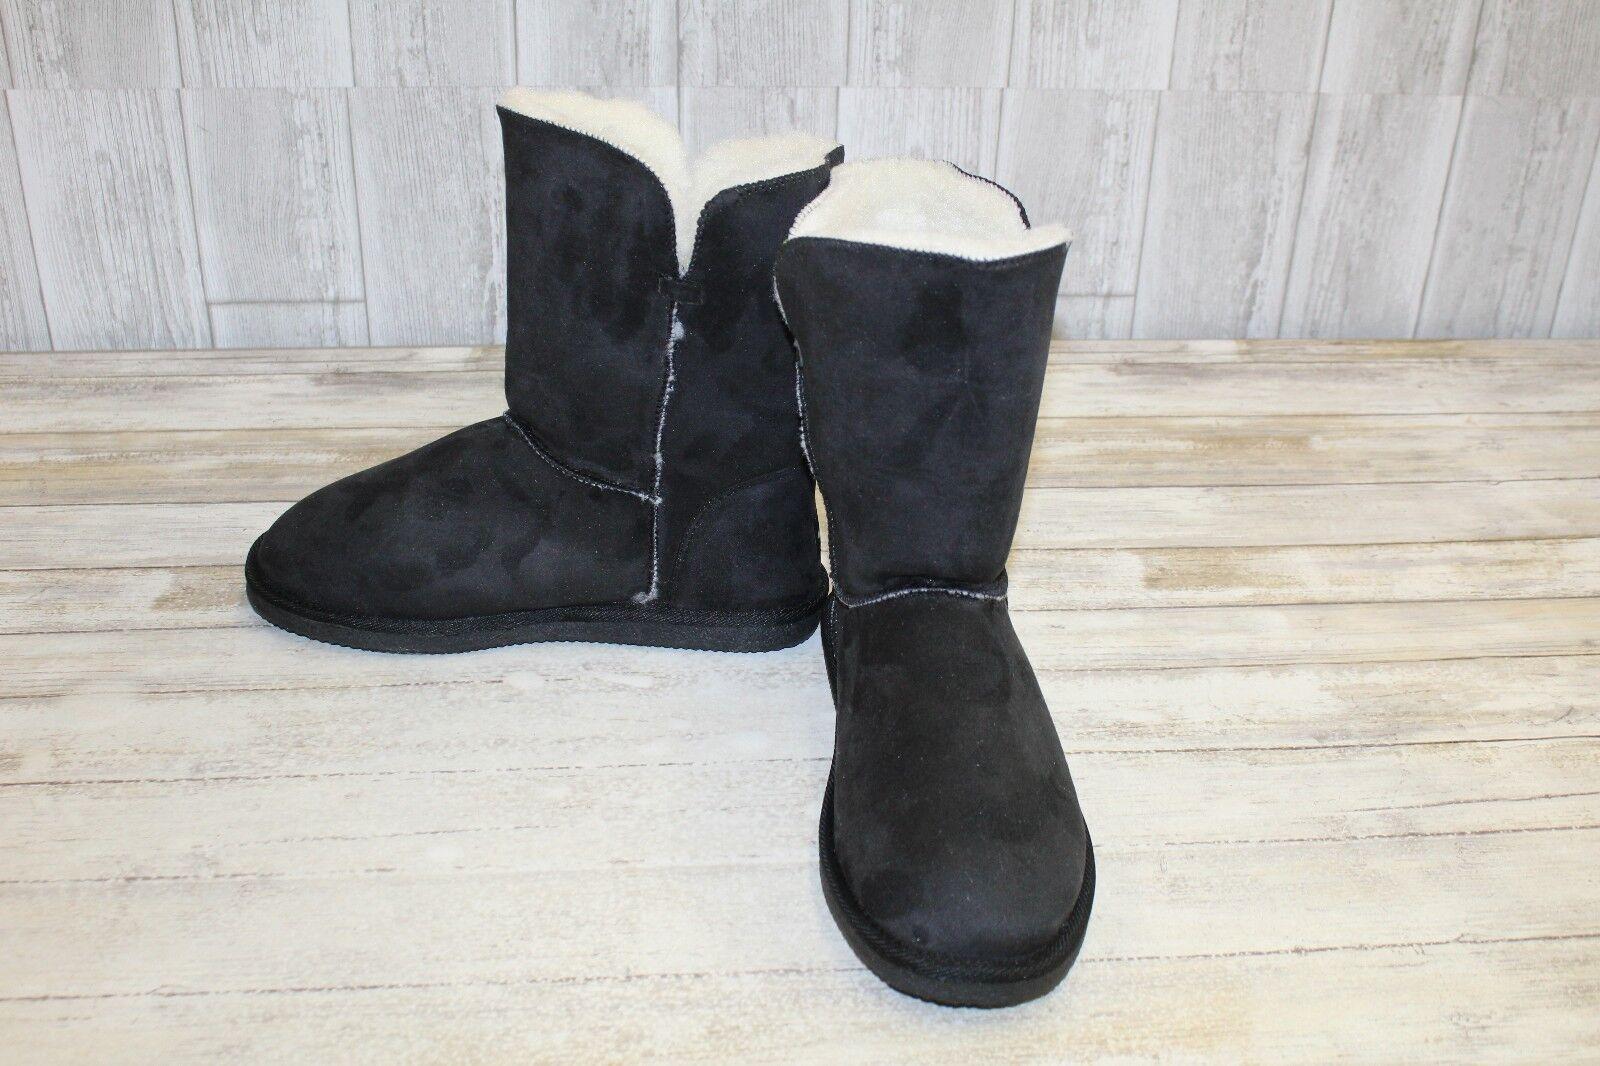 Willowbee Women's Sadie Boot - Size 11 M, Black